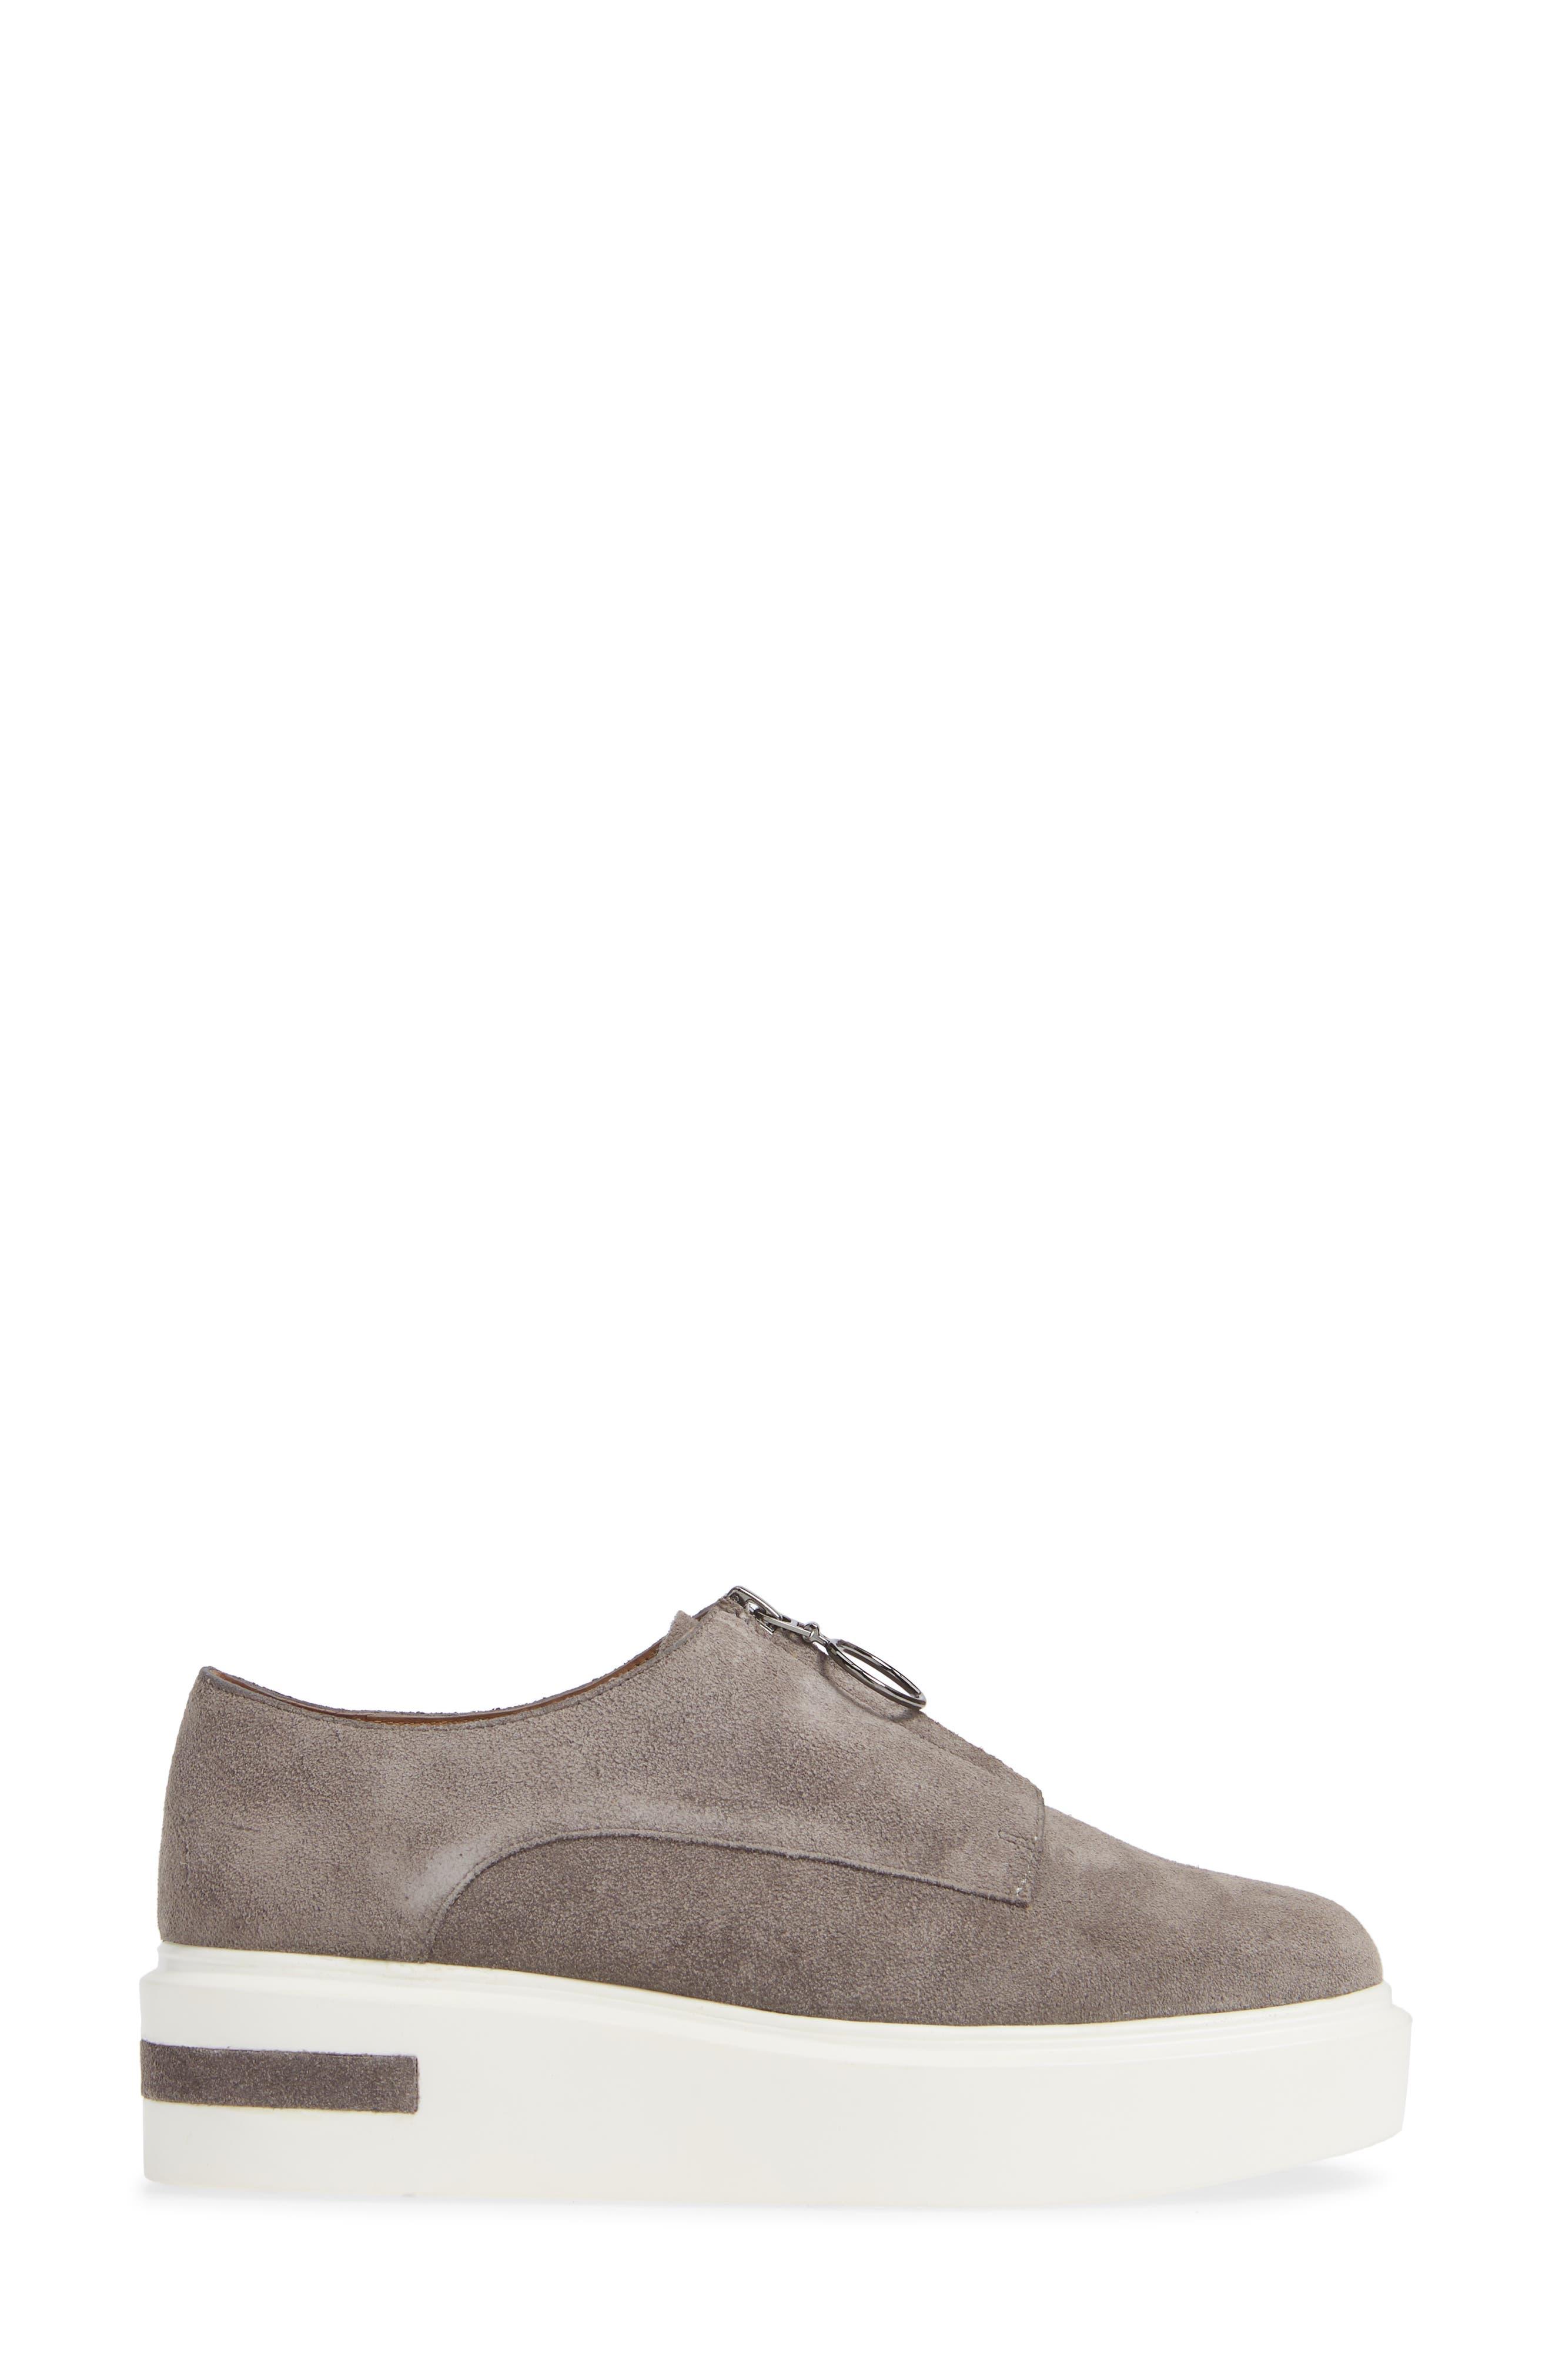 LINEA PAOLO, Kelani Platform Sneaker, Alternate thumbnail 3, color, STONE SUEDE